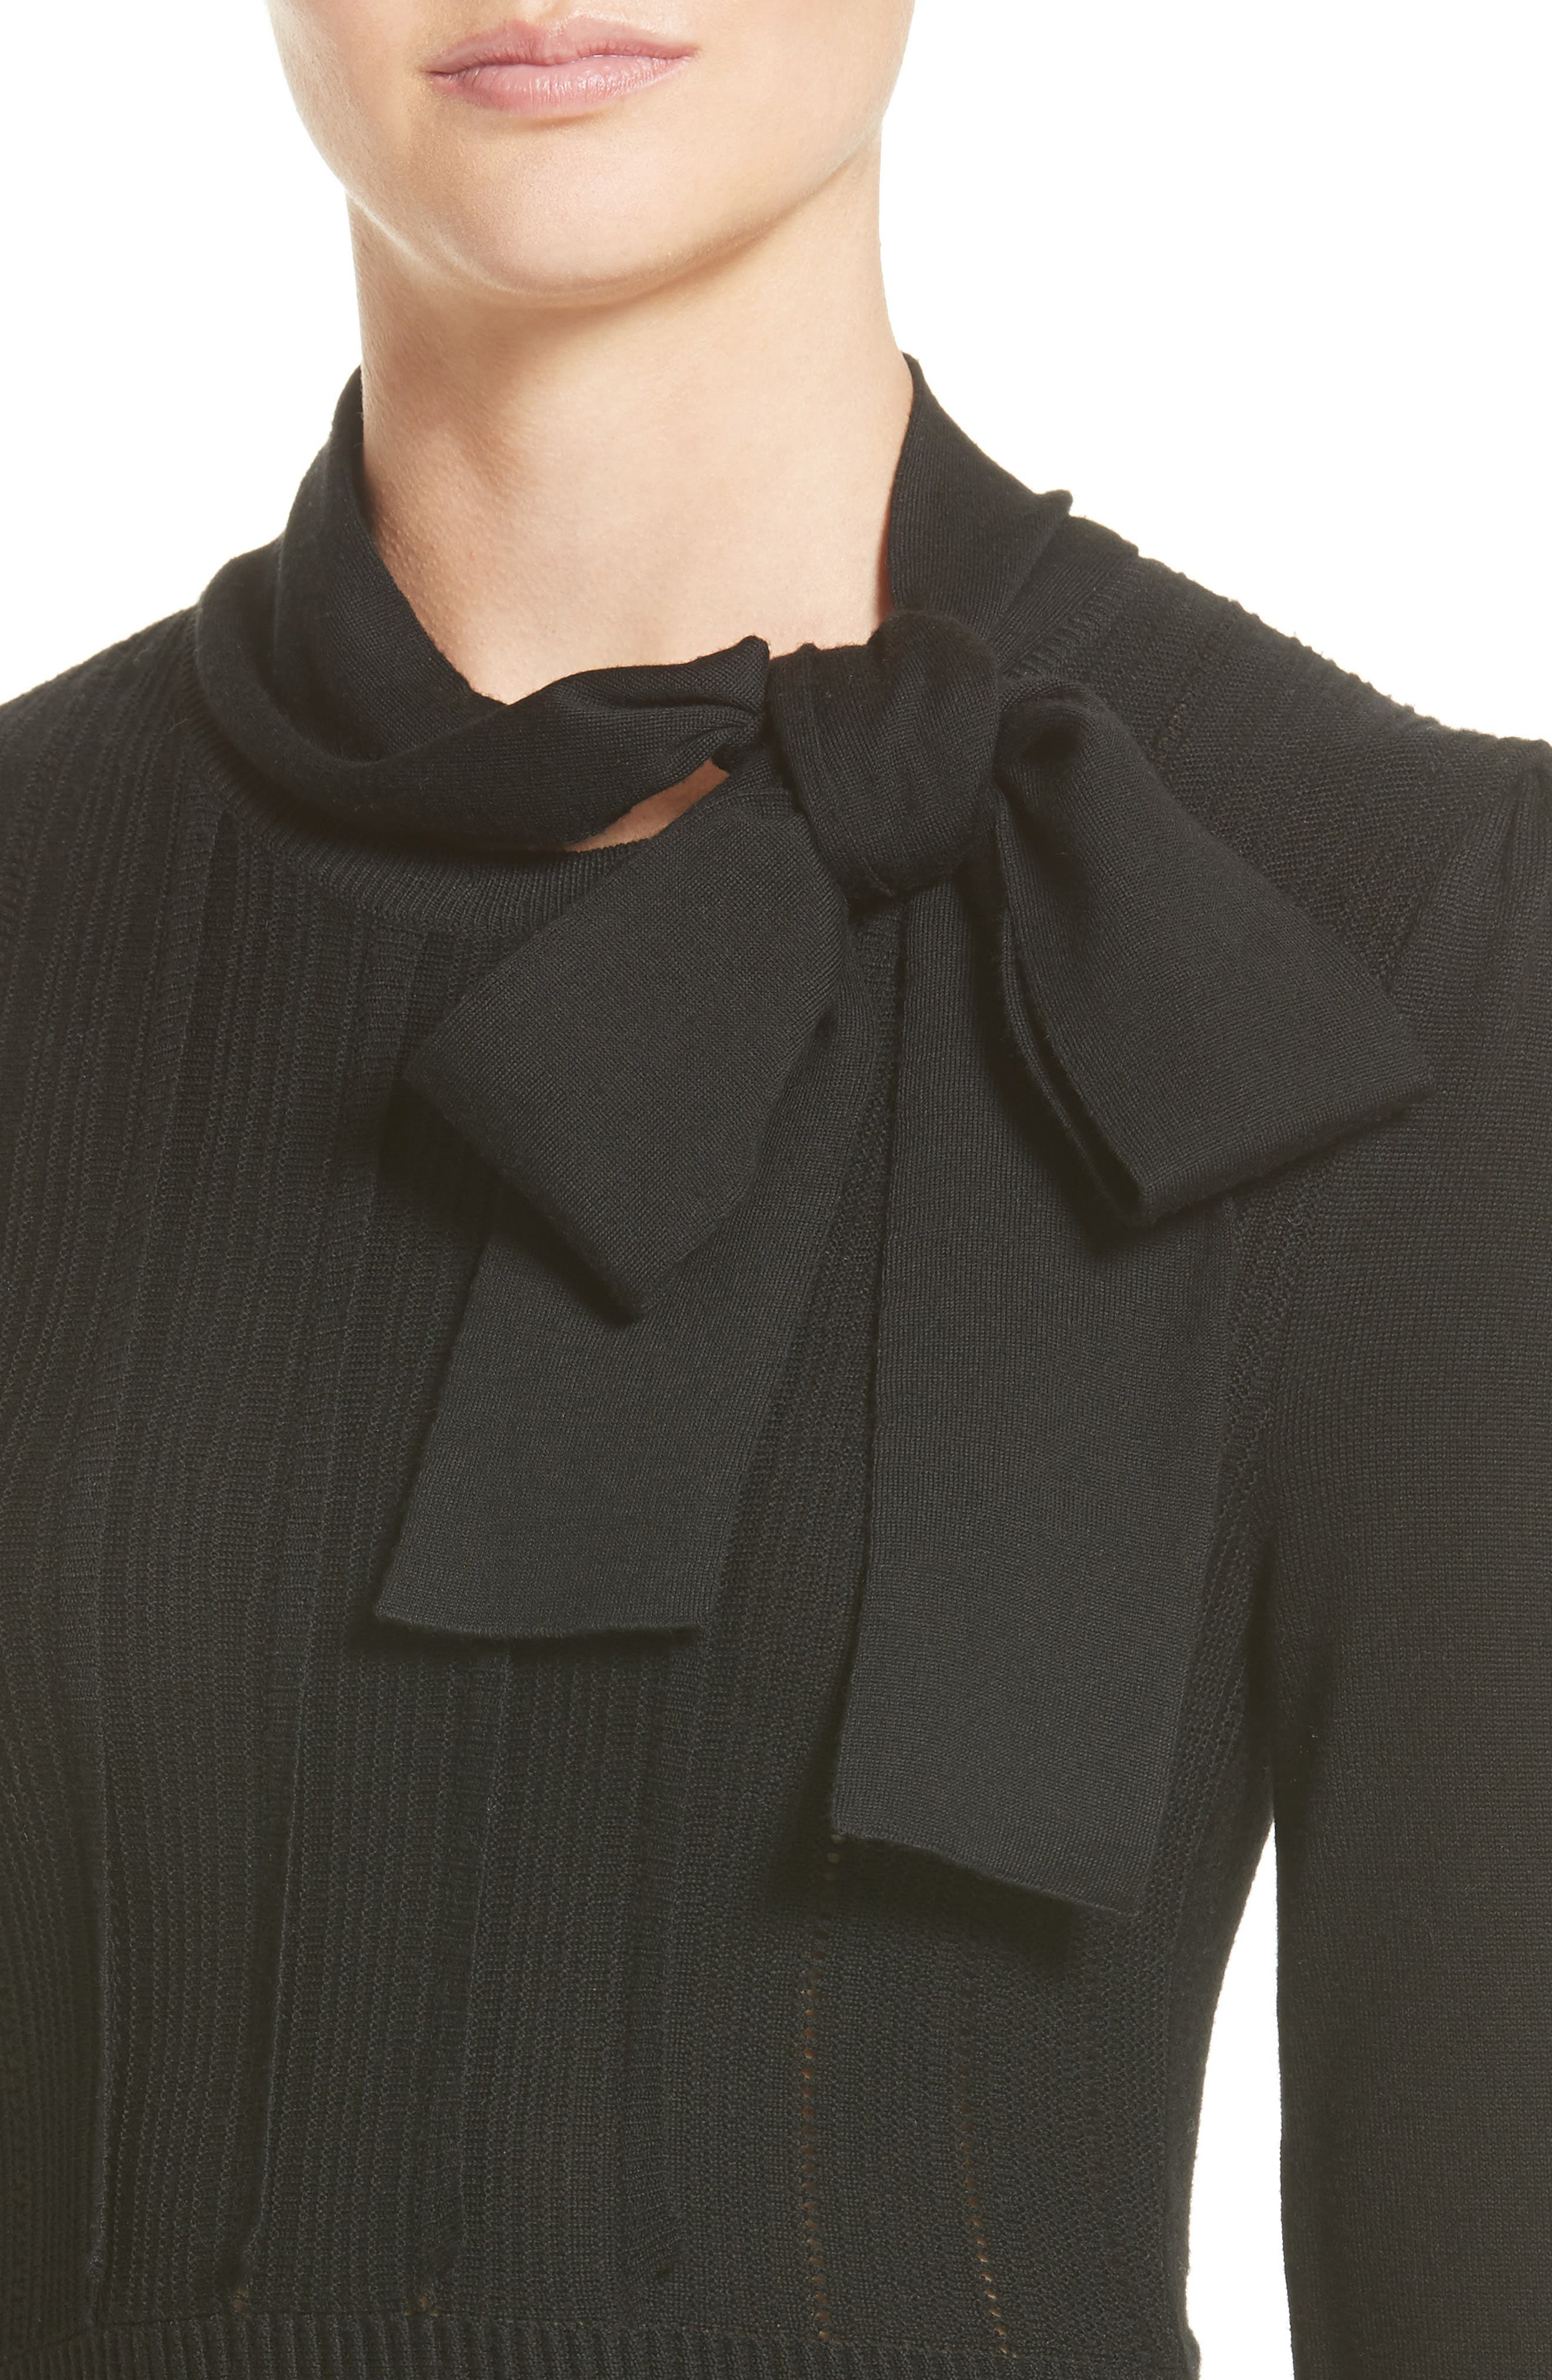 Ruffle Skirt Wool Knit Dress,                             Alternate thumbnail 4, color,                             001